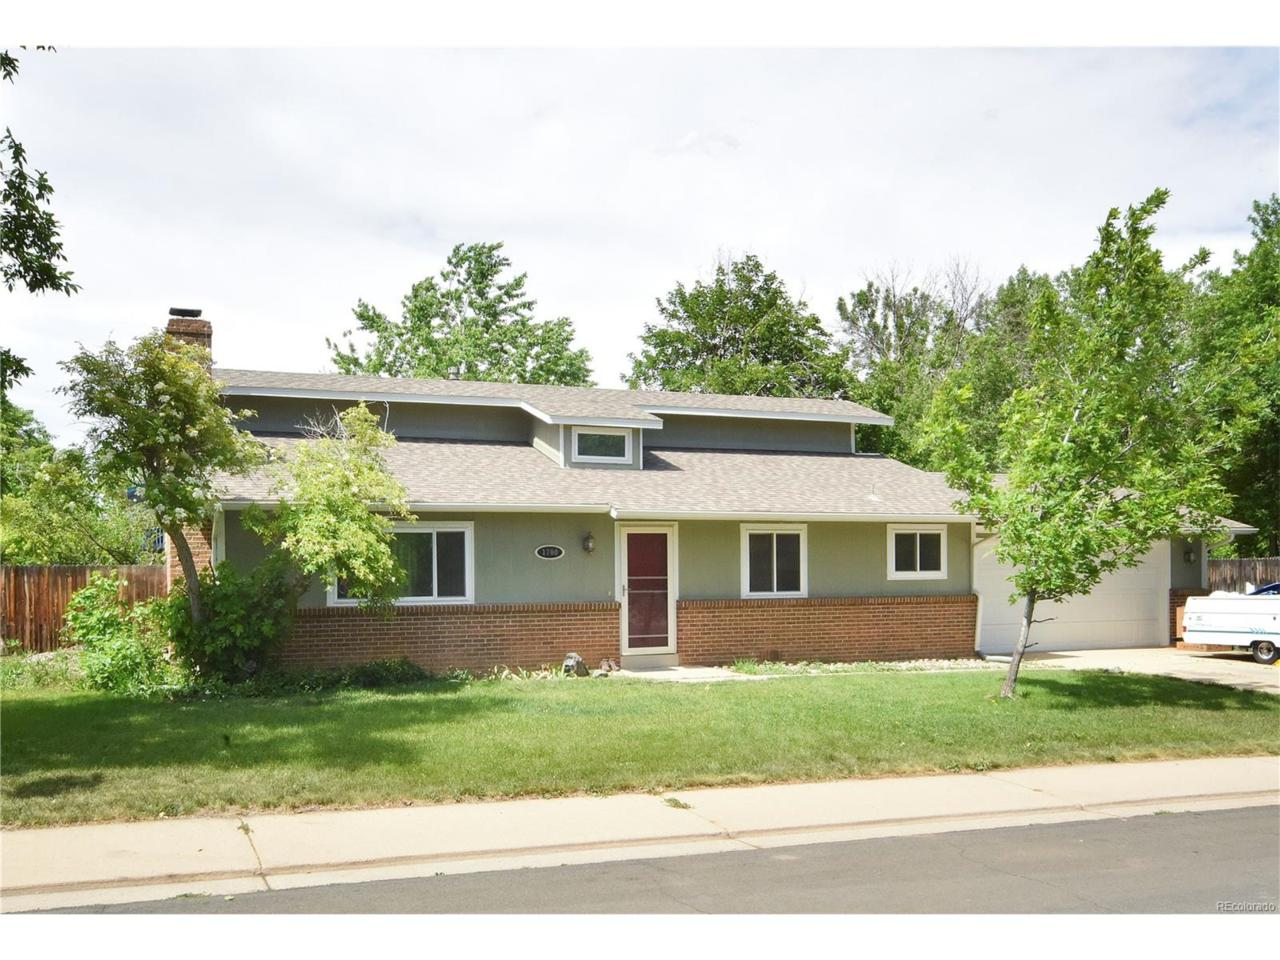 1700 Zeus Drive, Lafayette, CO 80026 (MLS #9641851) :: 8z Real Estate